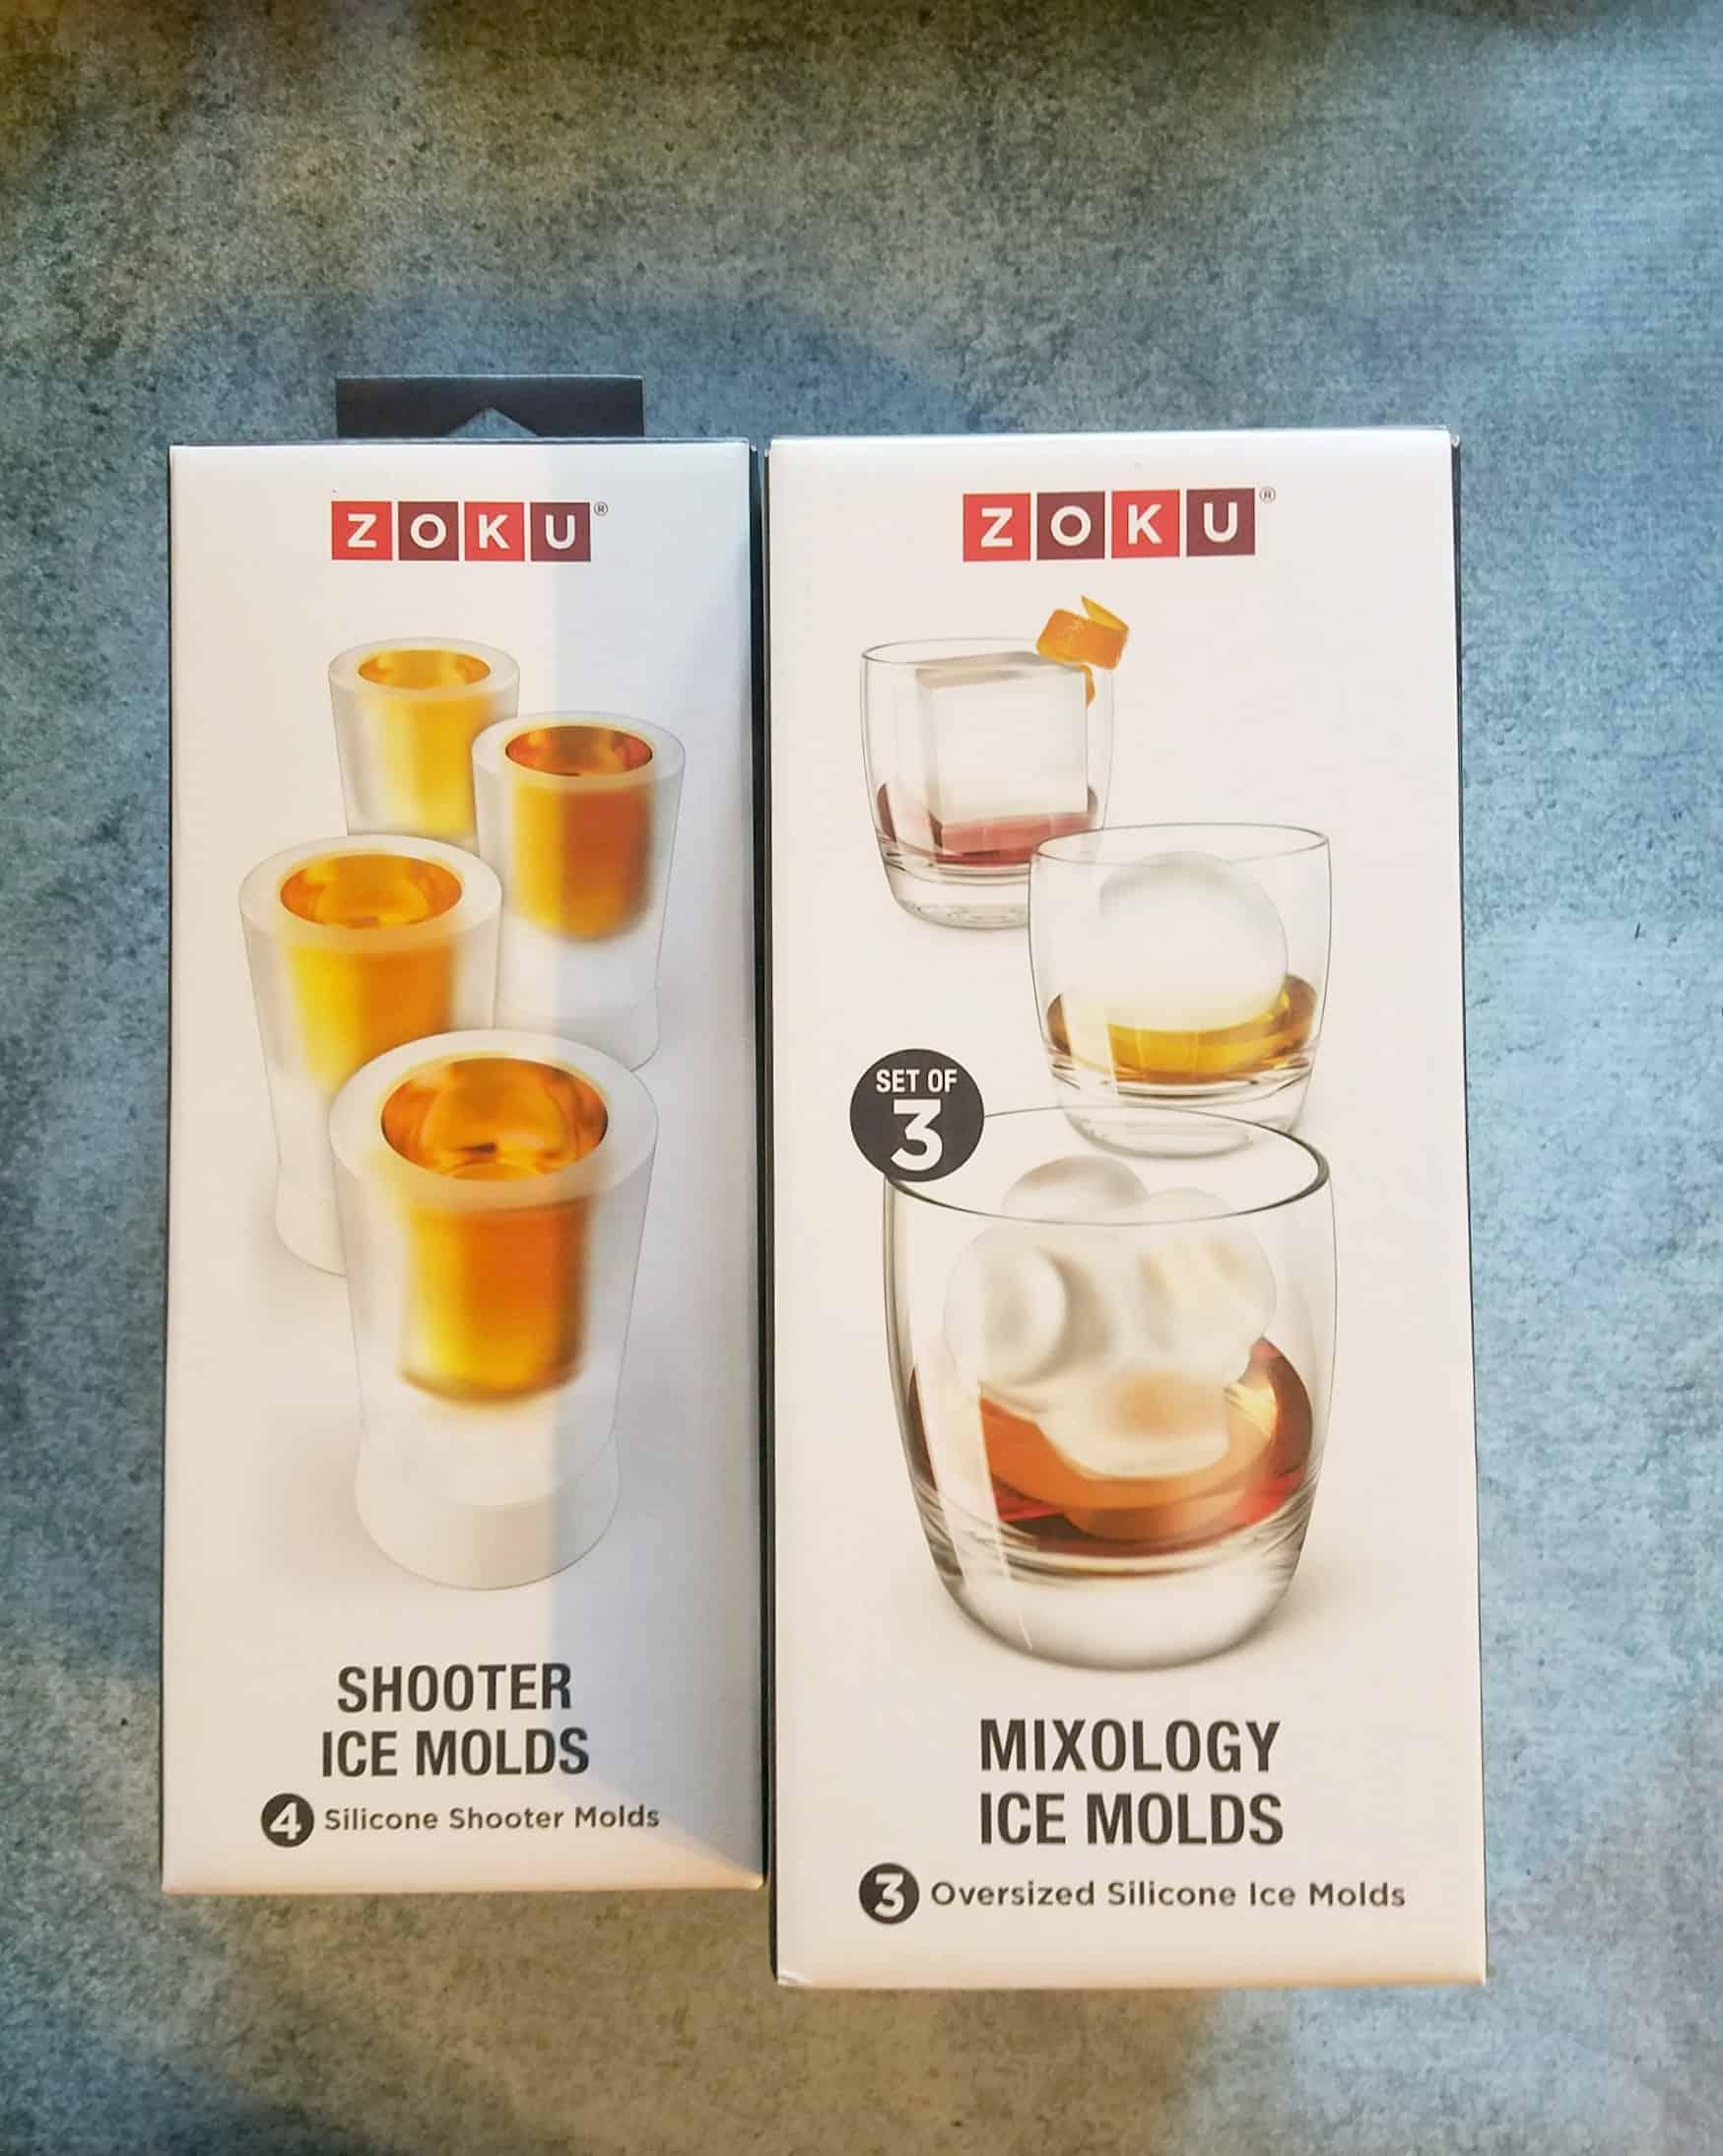 Zoku Mixology & Shooter Ice Molds